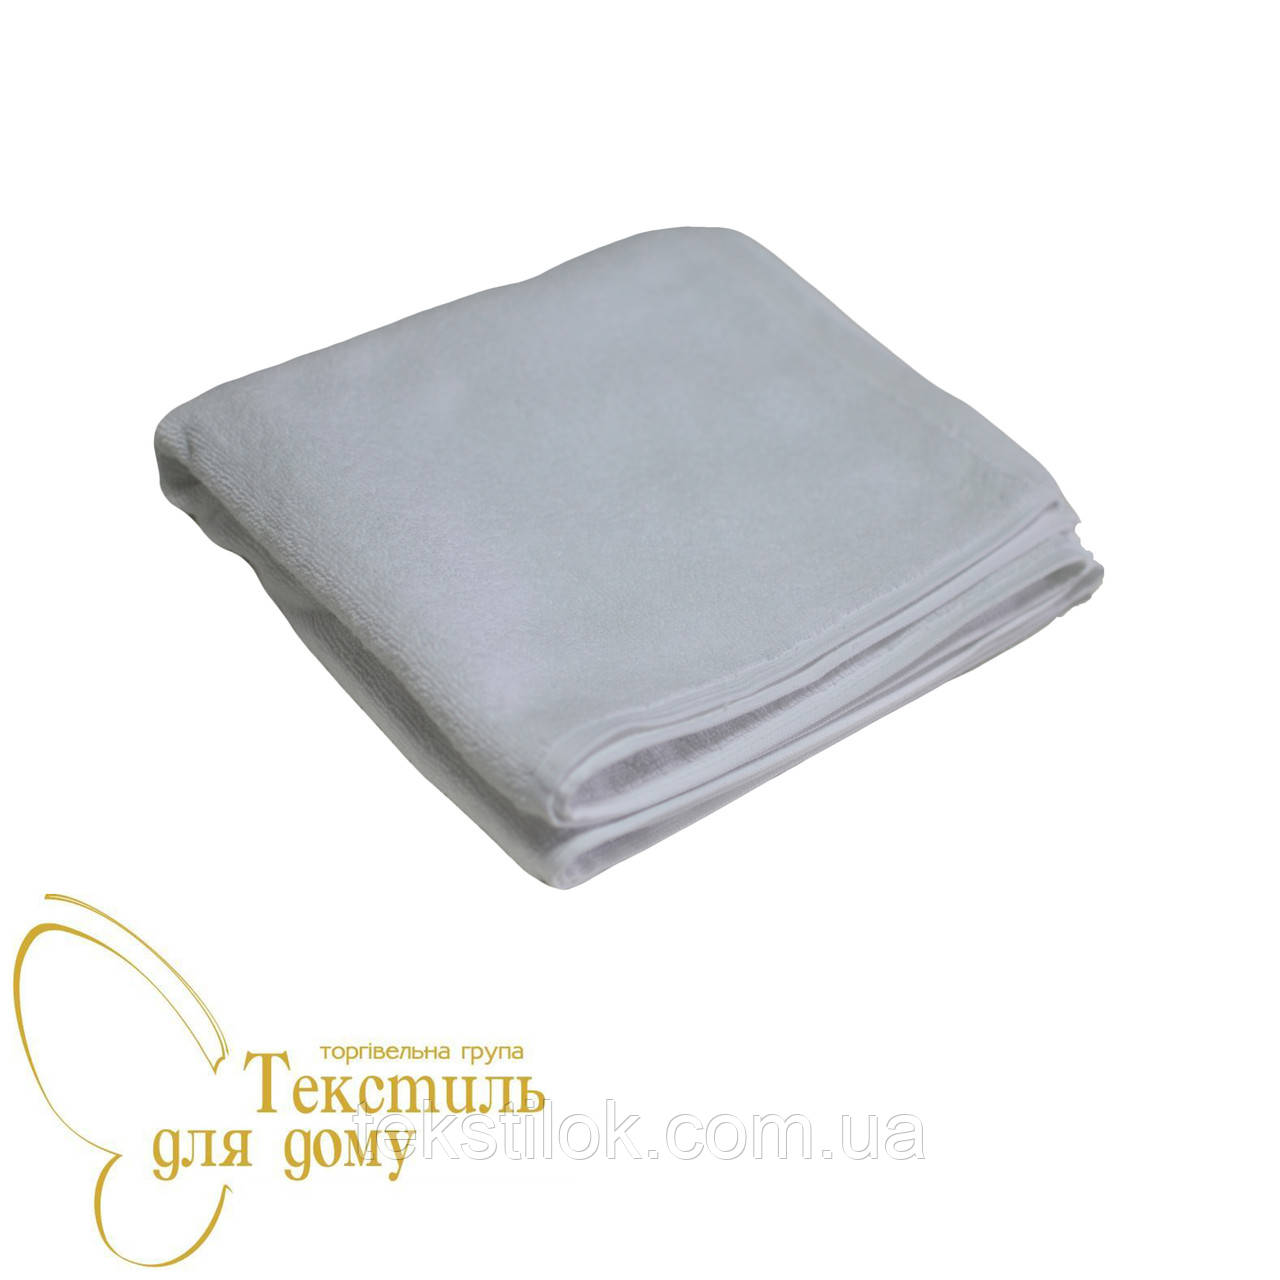 Полотенце белое 50*100